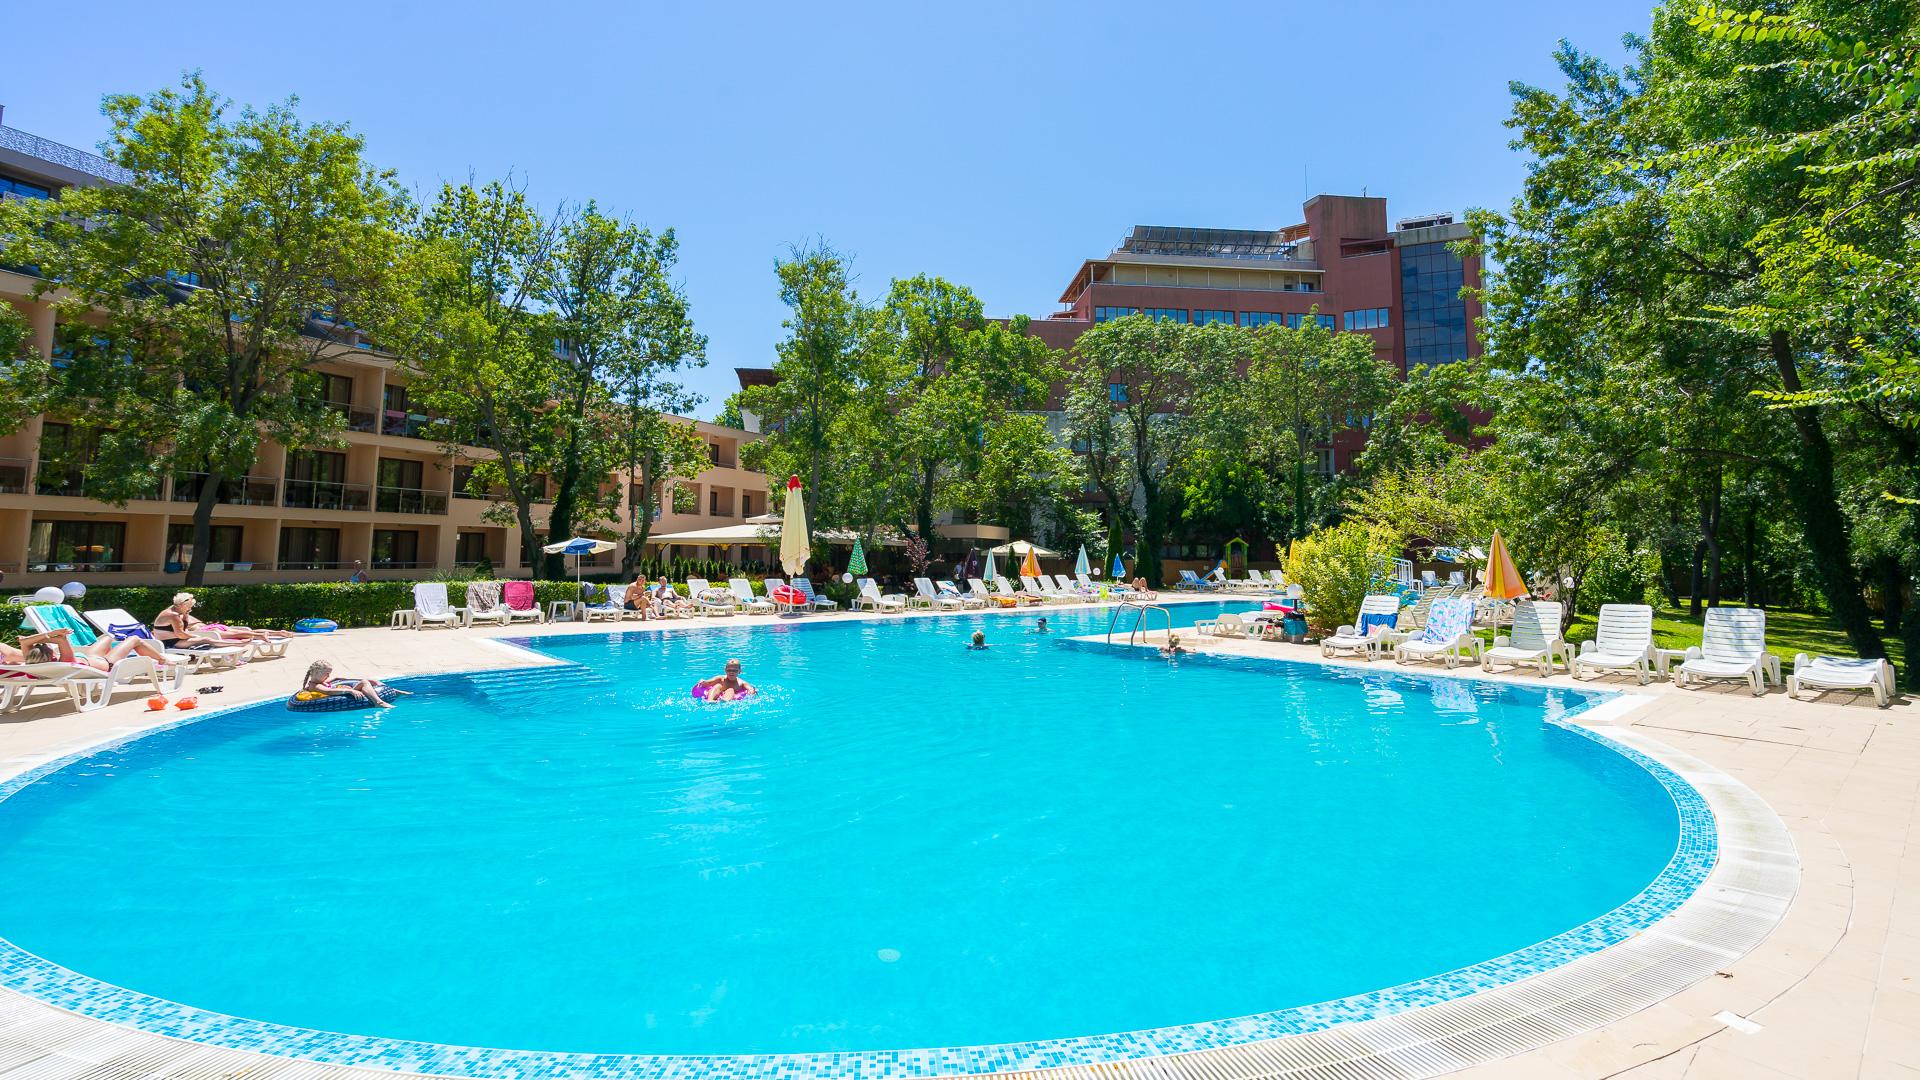 Hotel Yunona, Sunny Beach - Centralt & Ungdommeligt!